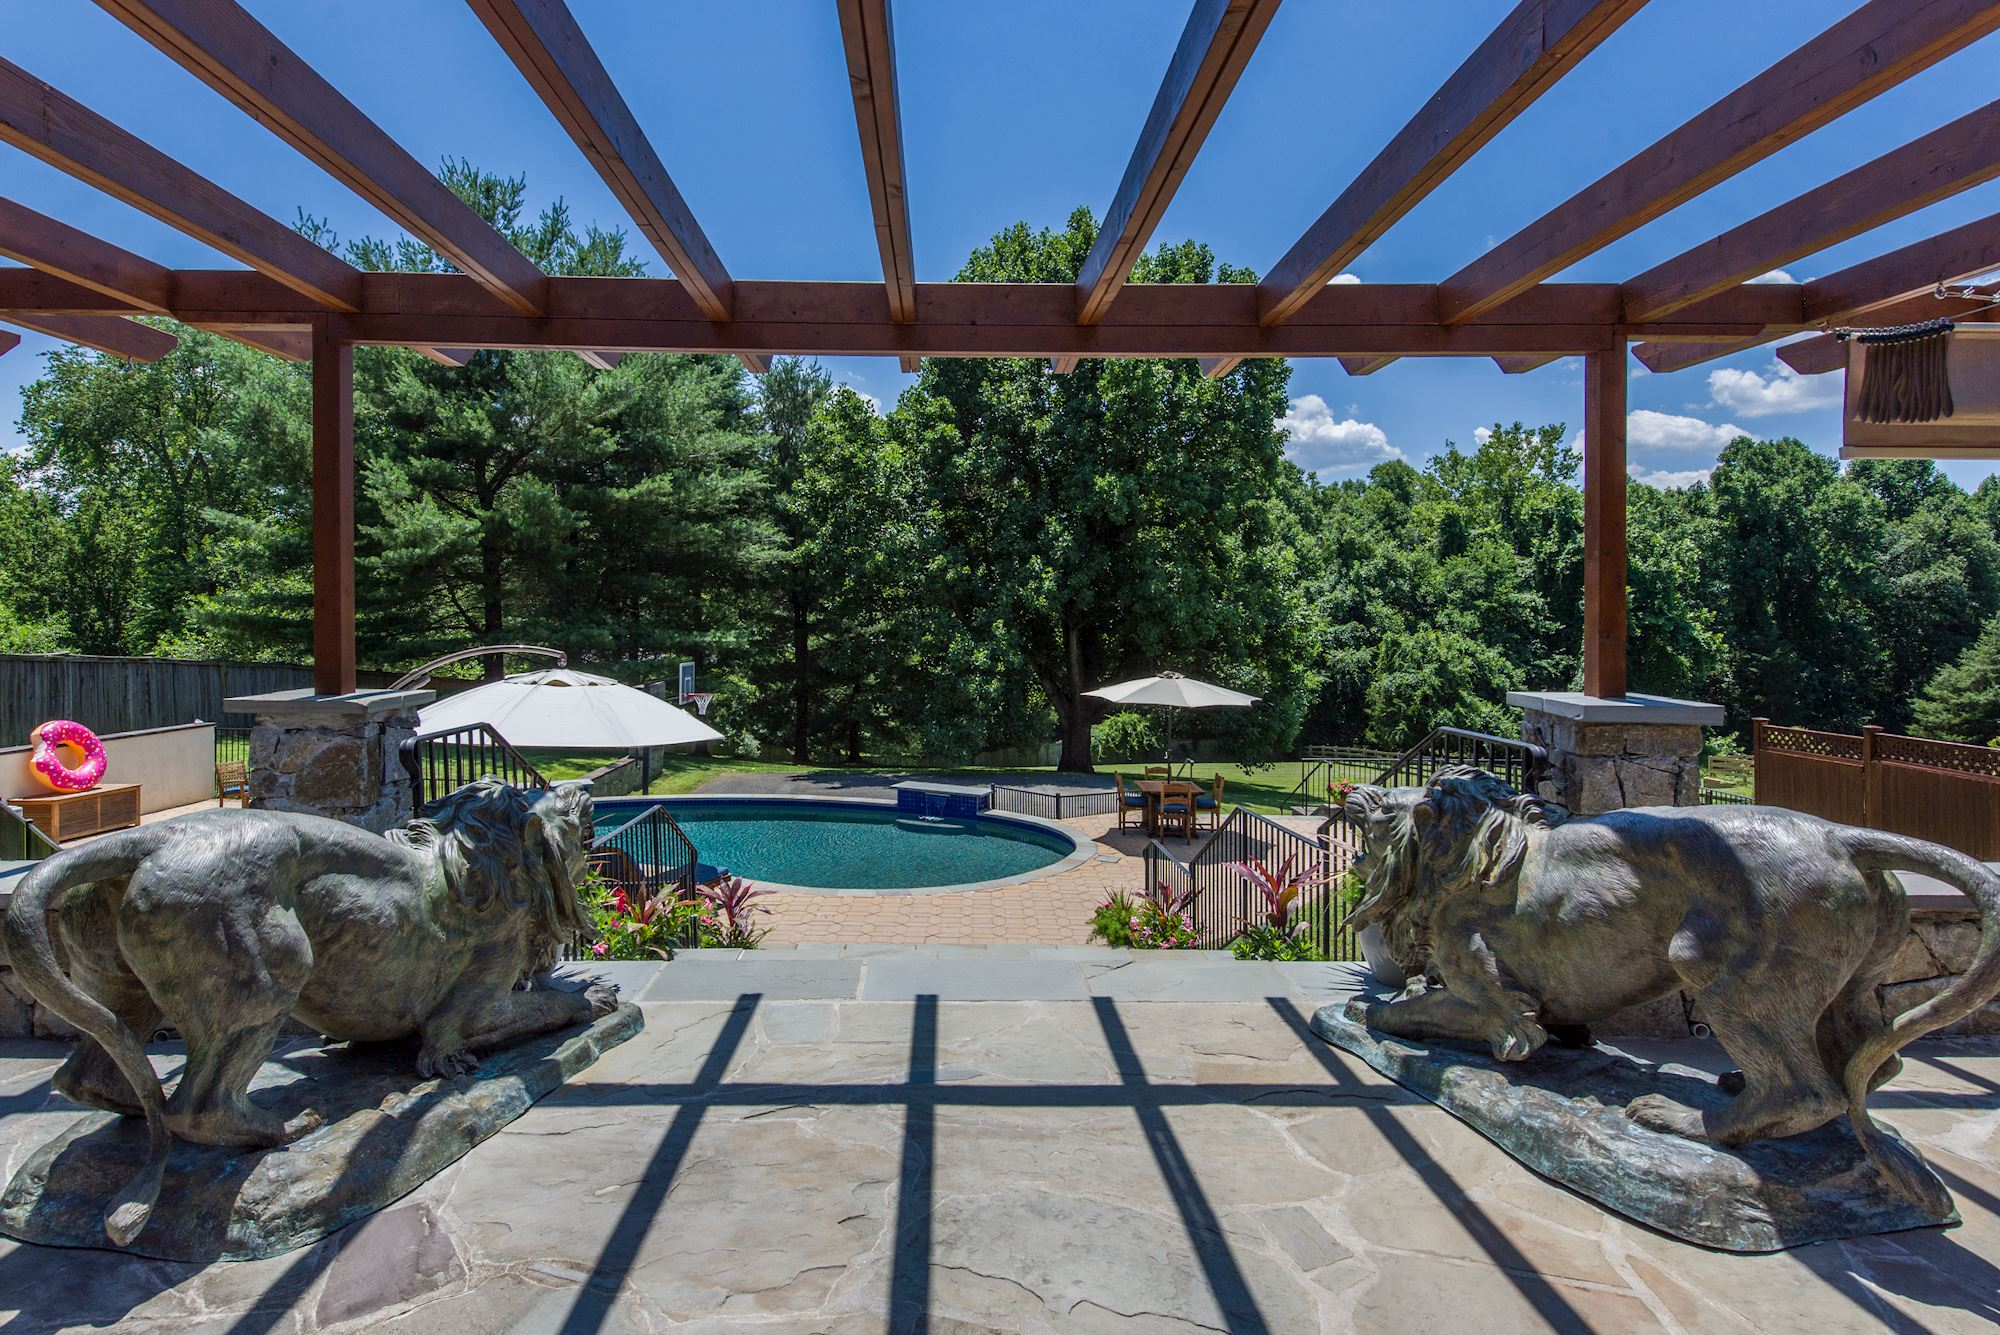 Washington Fine Properties: 13329 QUERY MILL RD, NORTH POTOMAC, MD 20878